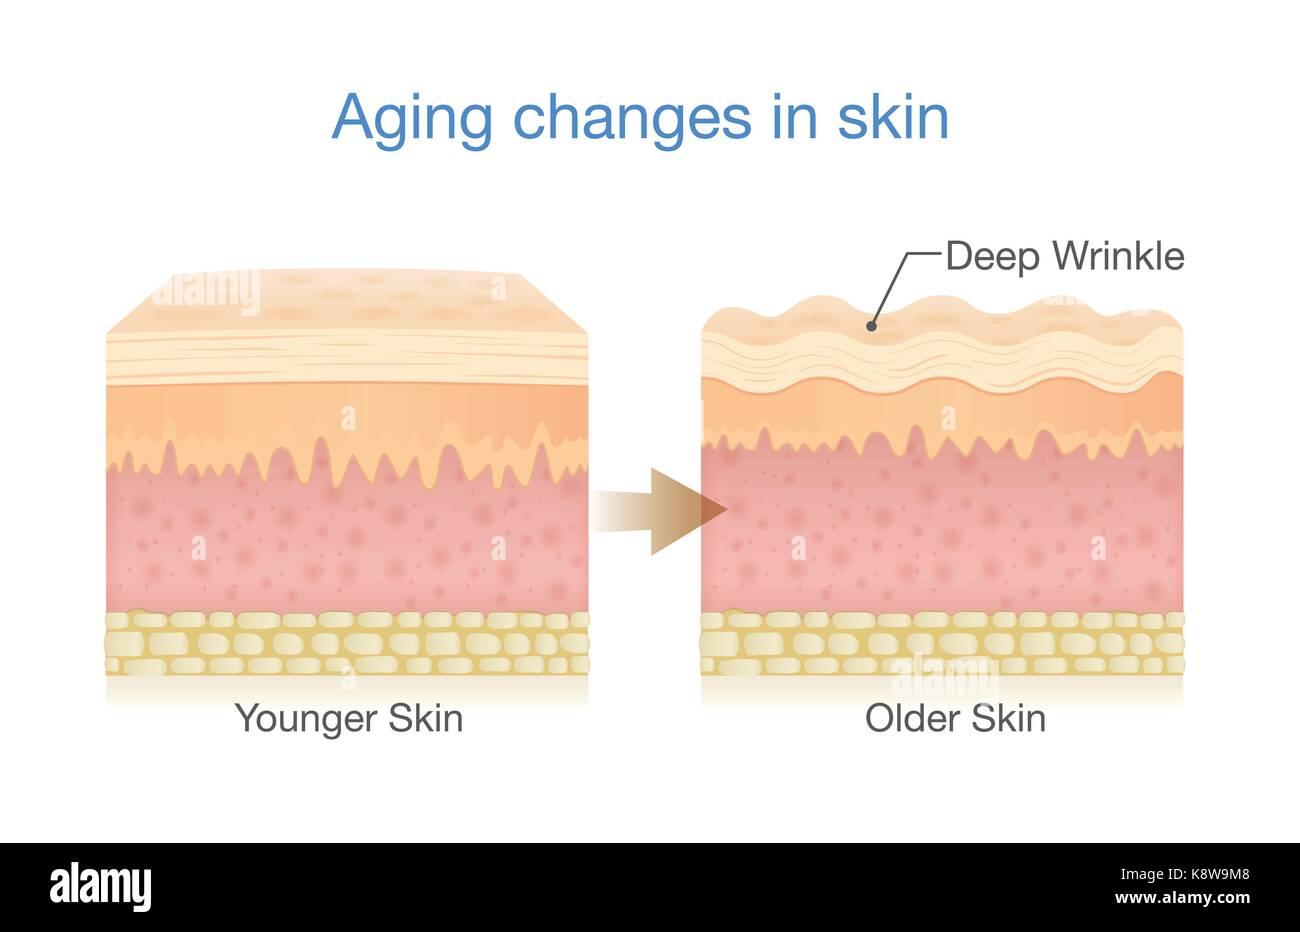 Aging Changes in Skin - Stock Vector